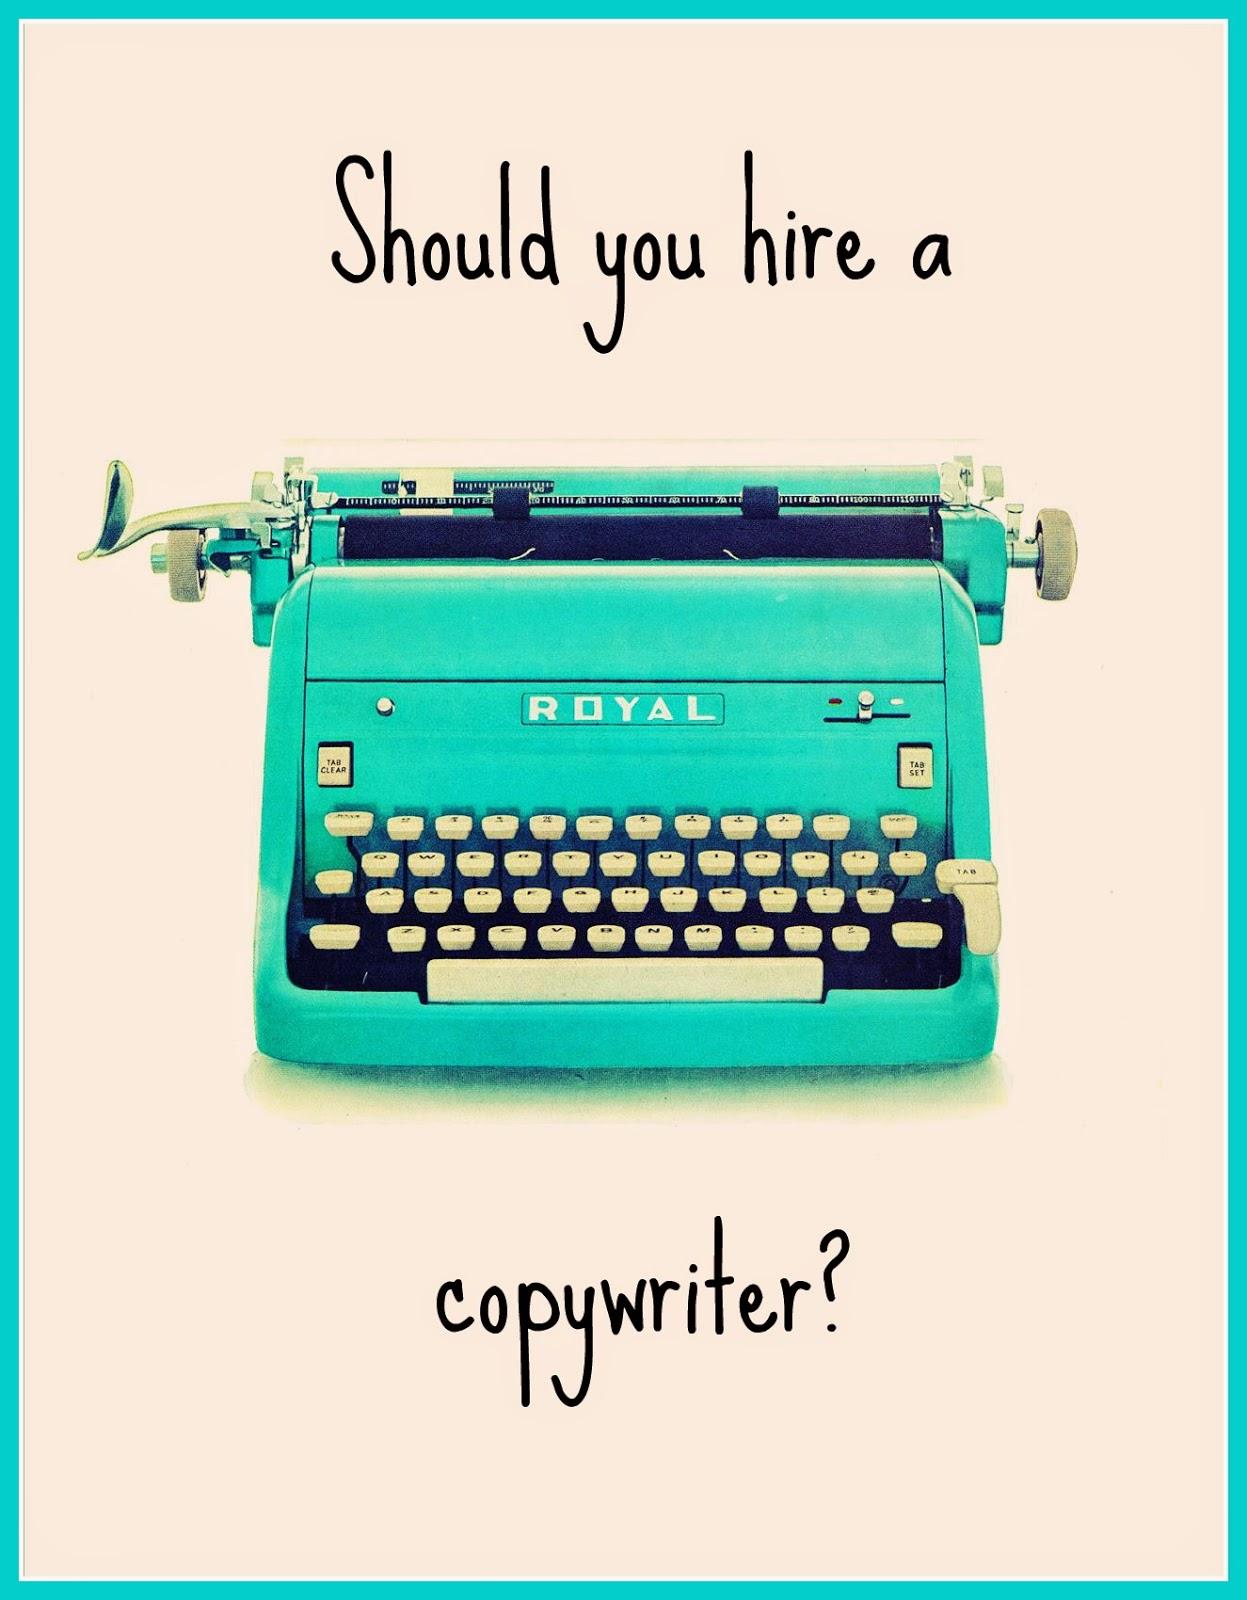 Copywriter is